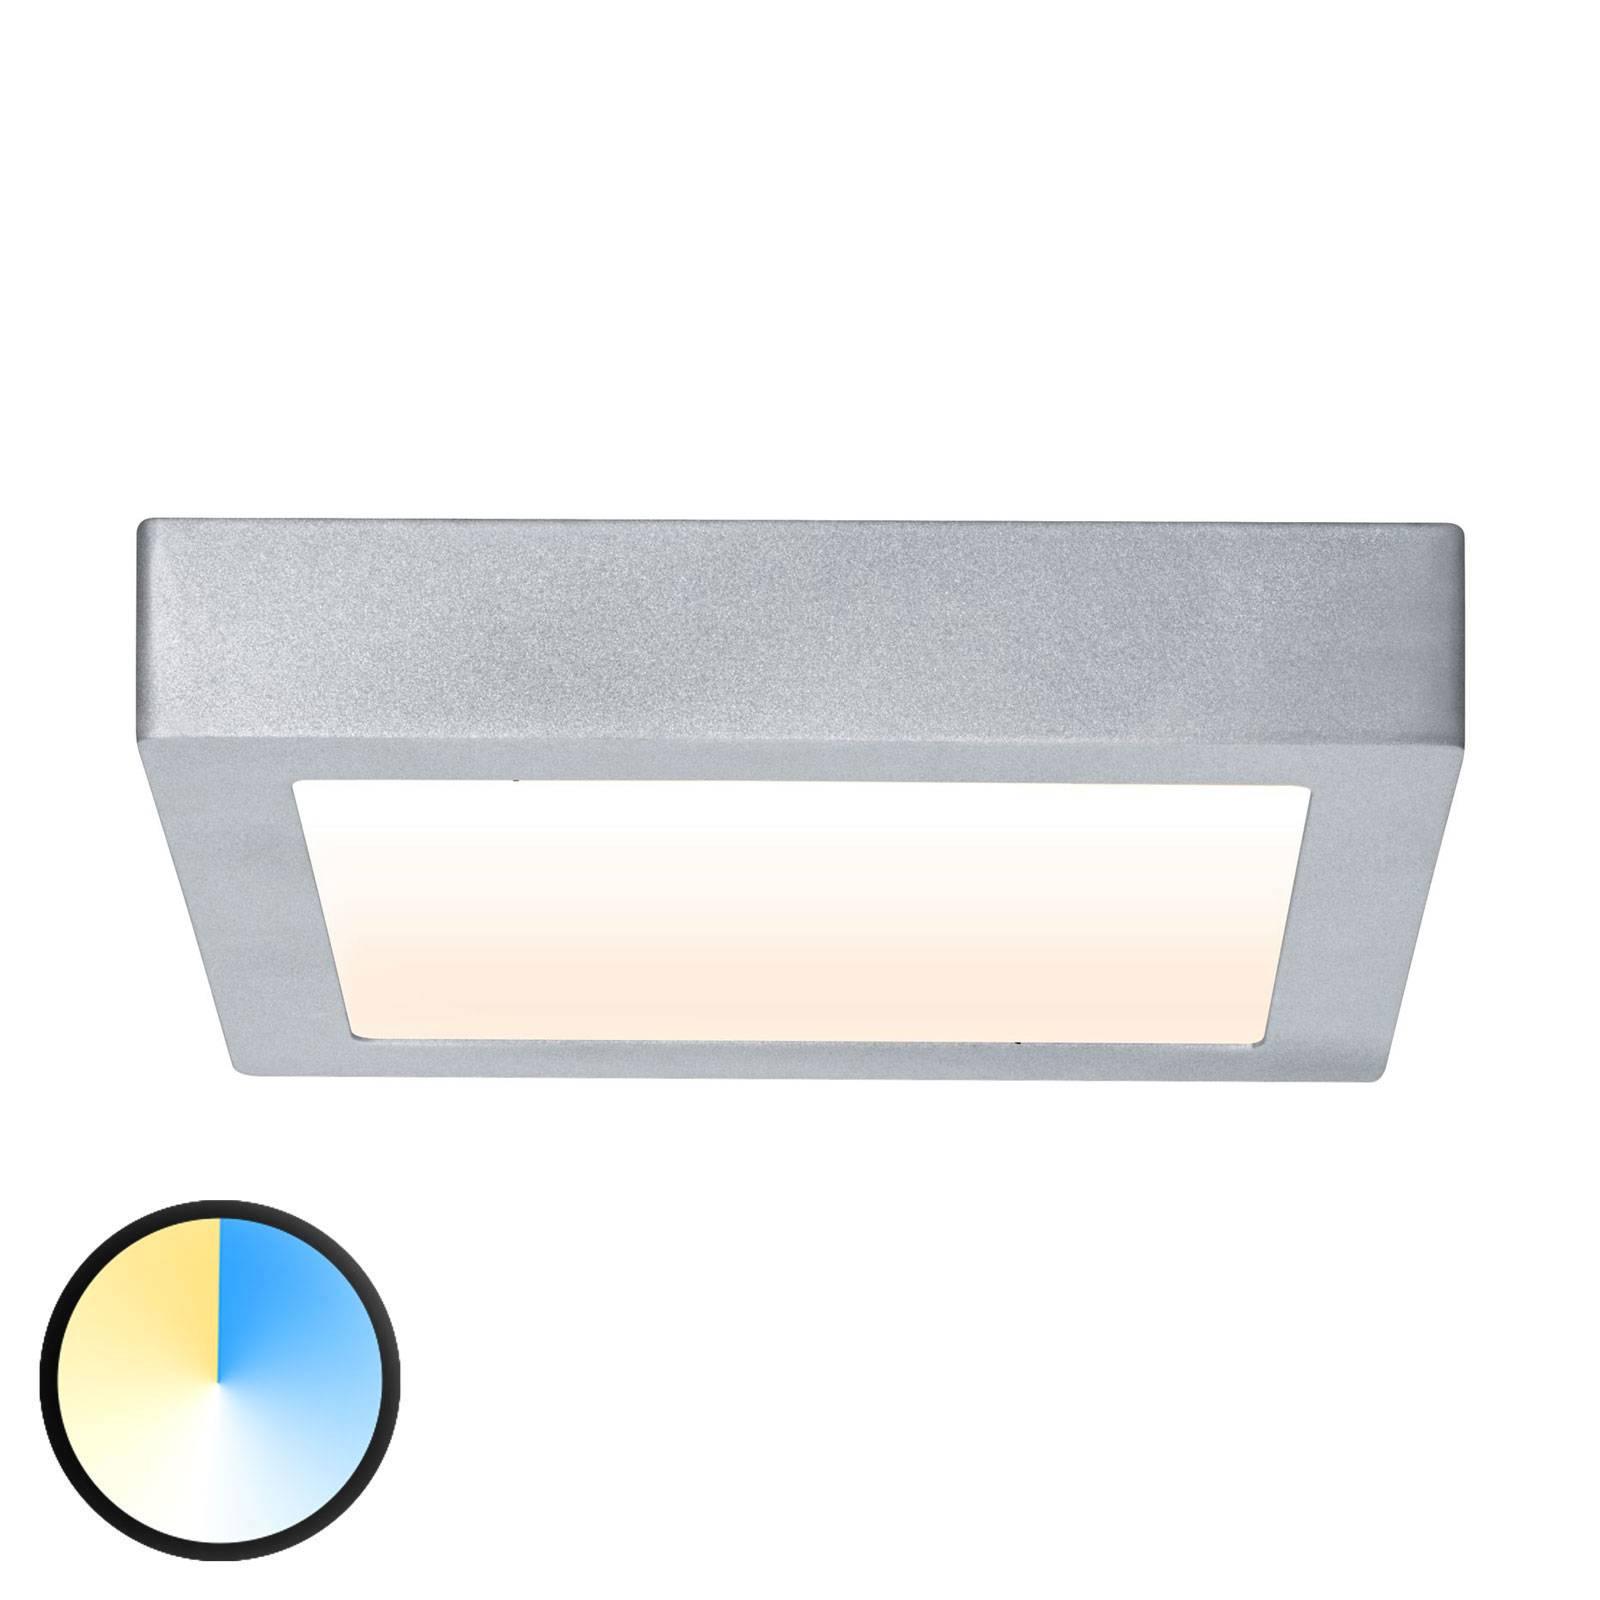 Paulmann Carpo -LED-kattovalaisin 22,5 x 22,5 cm